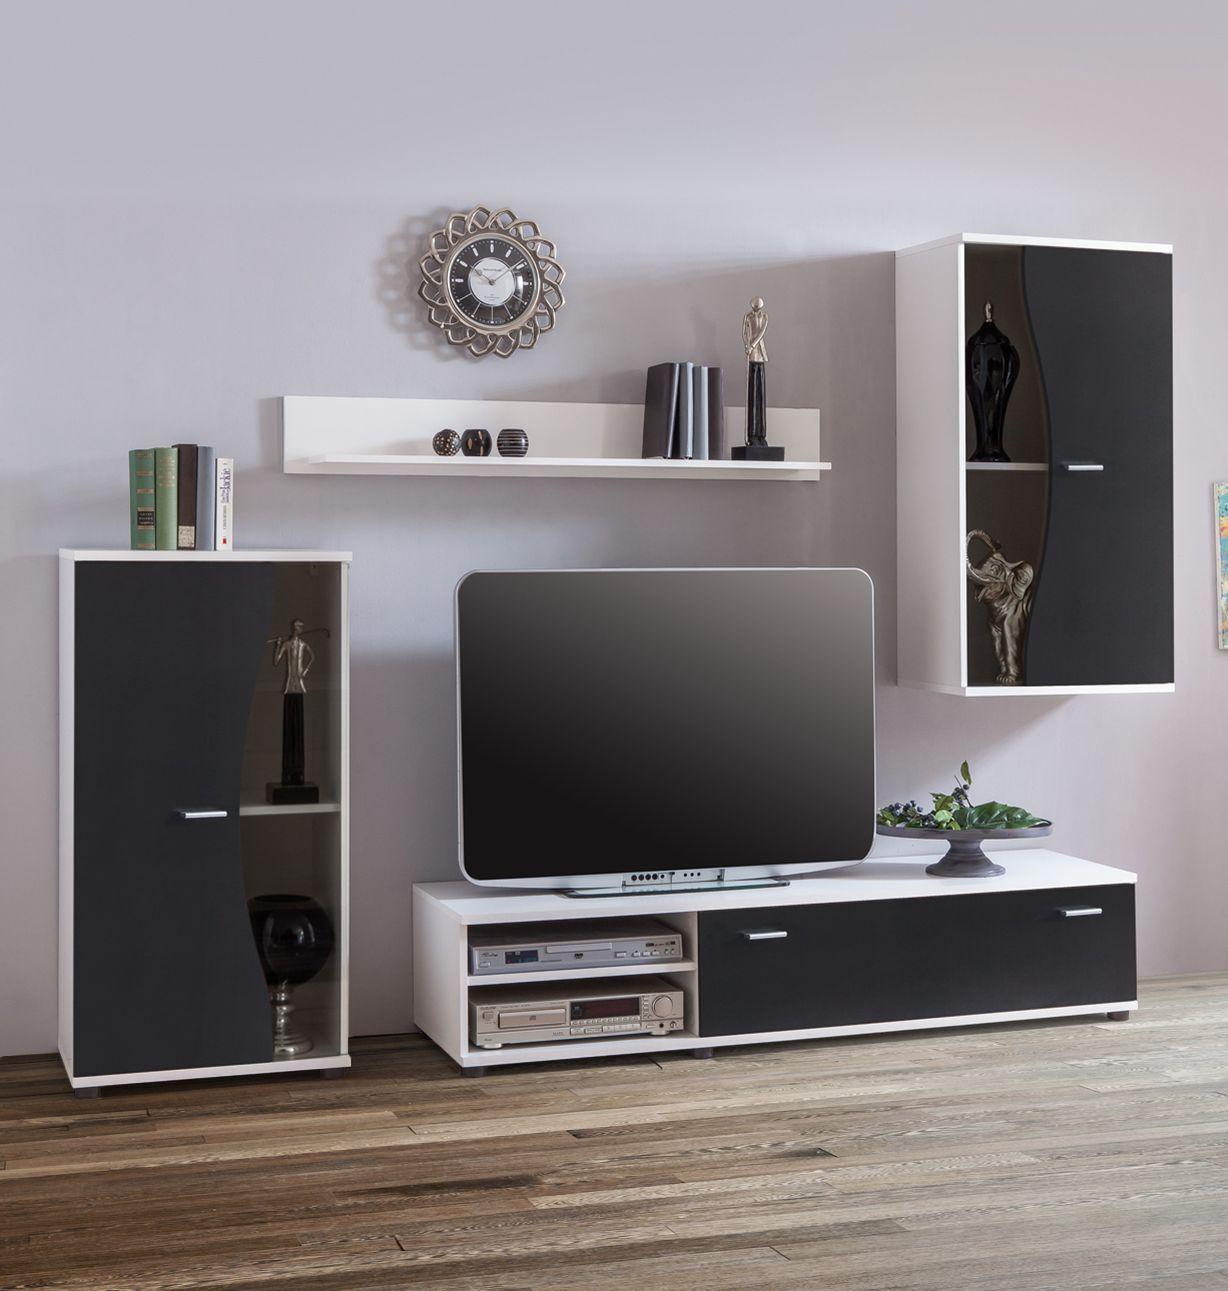 wohnwand ohne tv finest wohnwand vita i teilig kernbuche. Black Bedroom Furniture Sets. Home Design Ideas